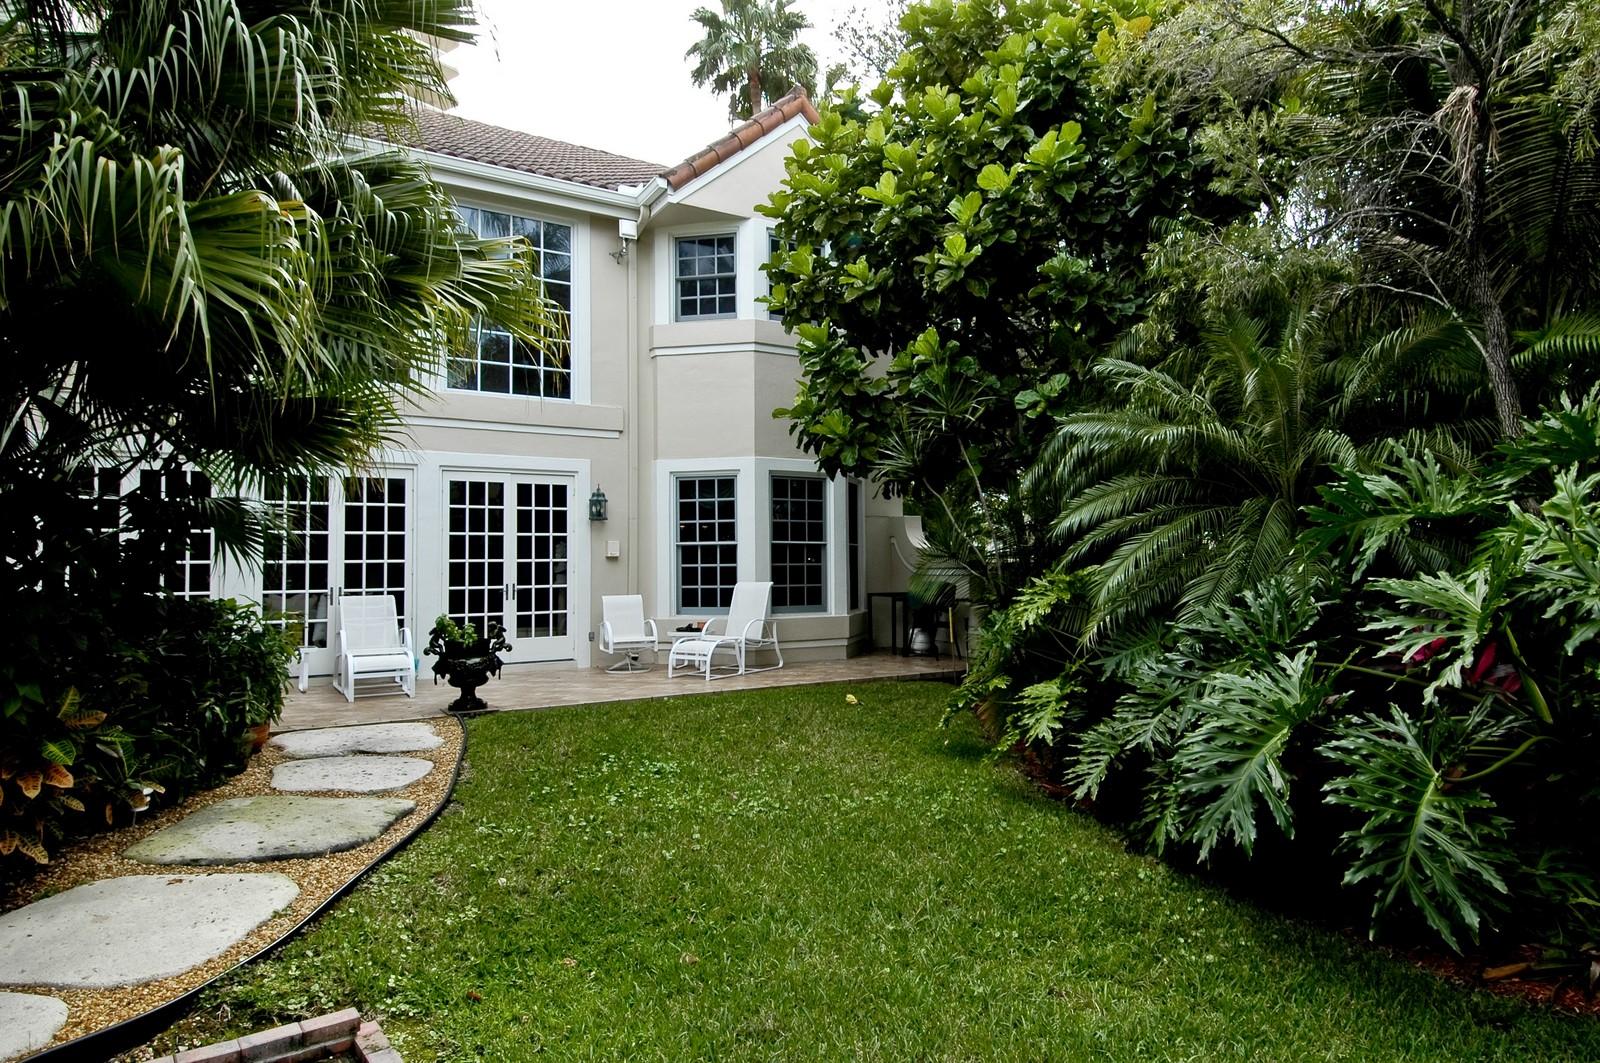 Real Estate Photography - 3685 NE 195 Ter, Aventura, FL, 33180 - Rear View